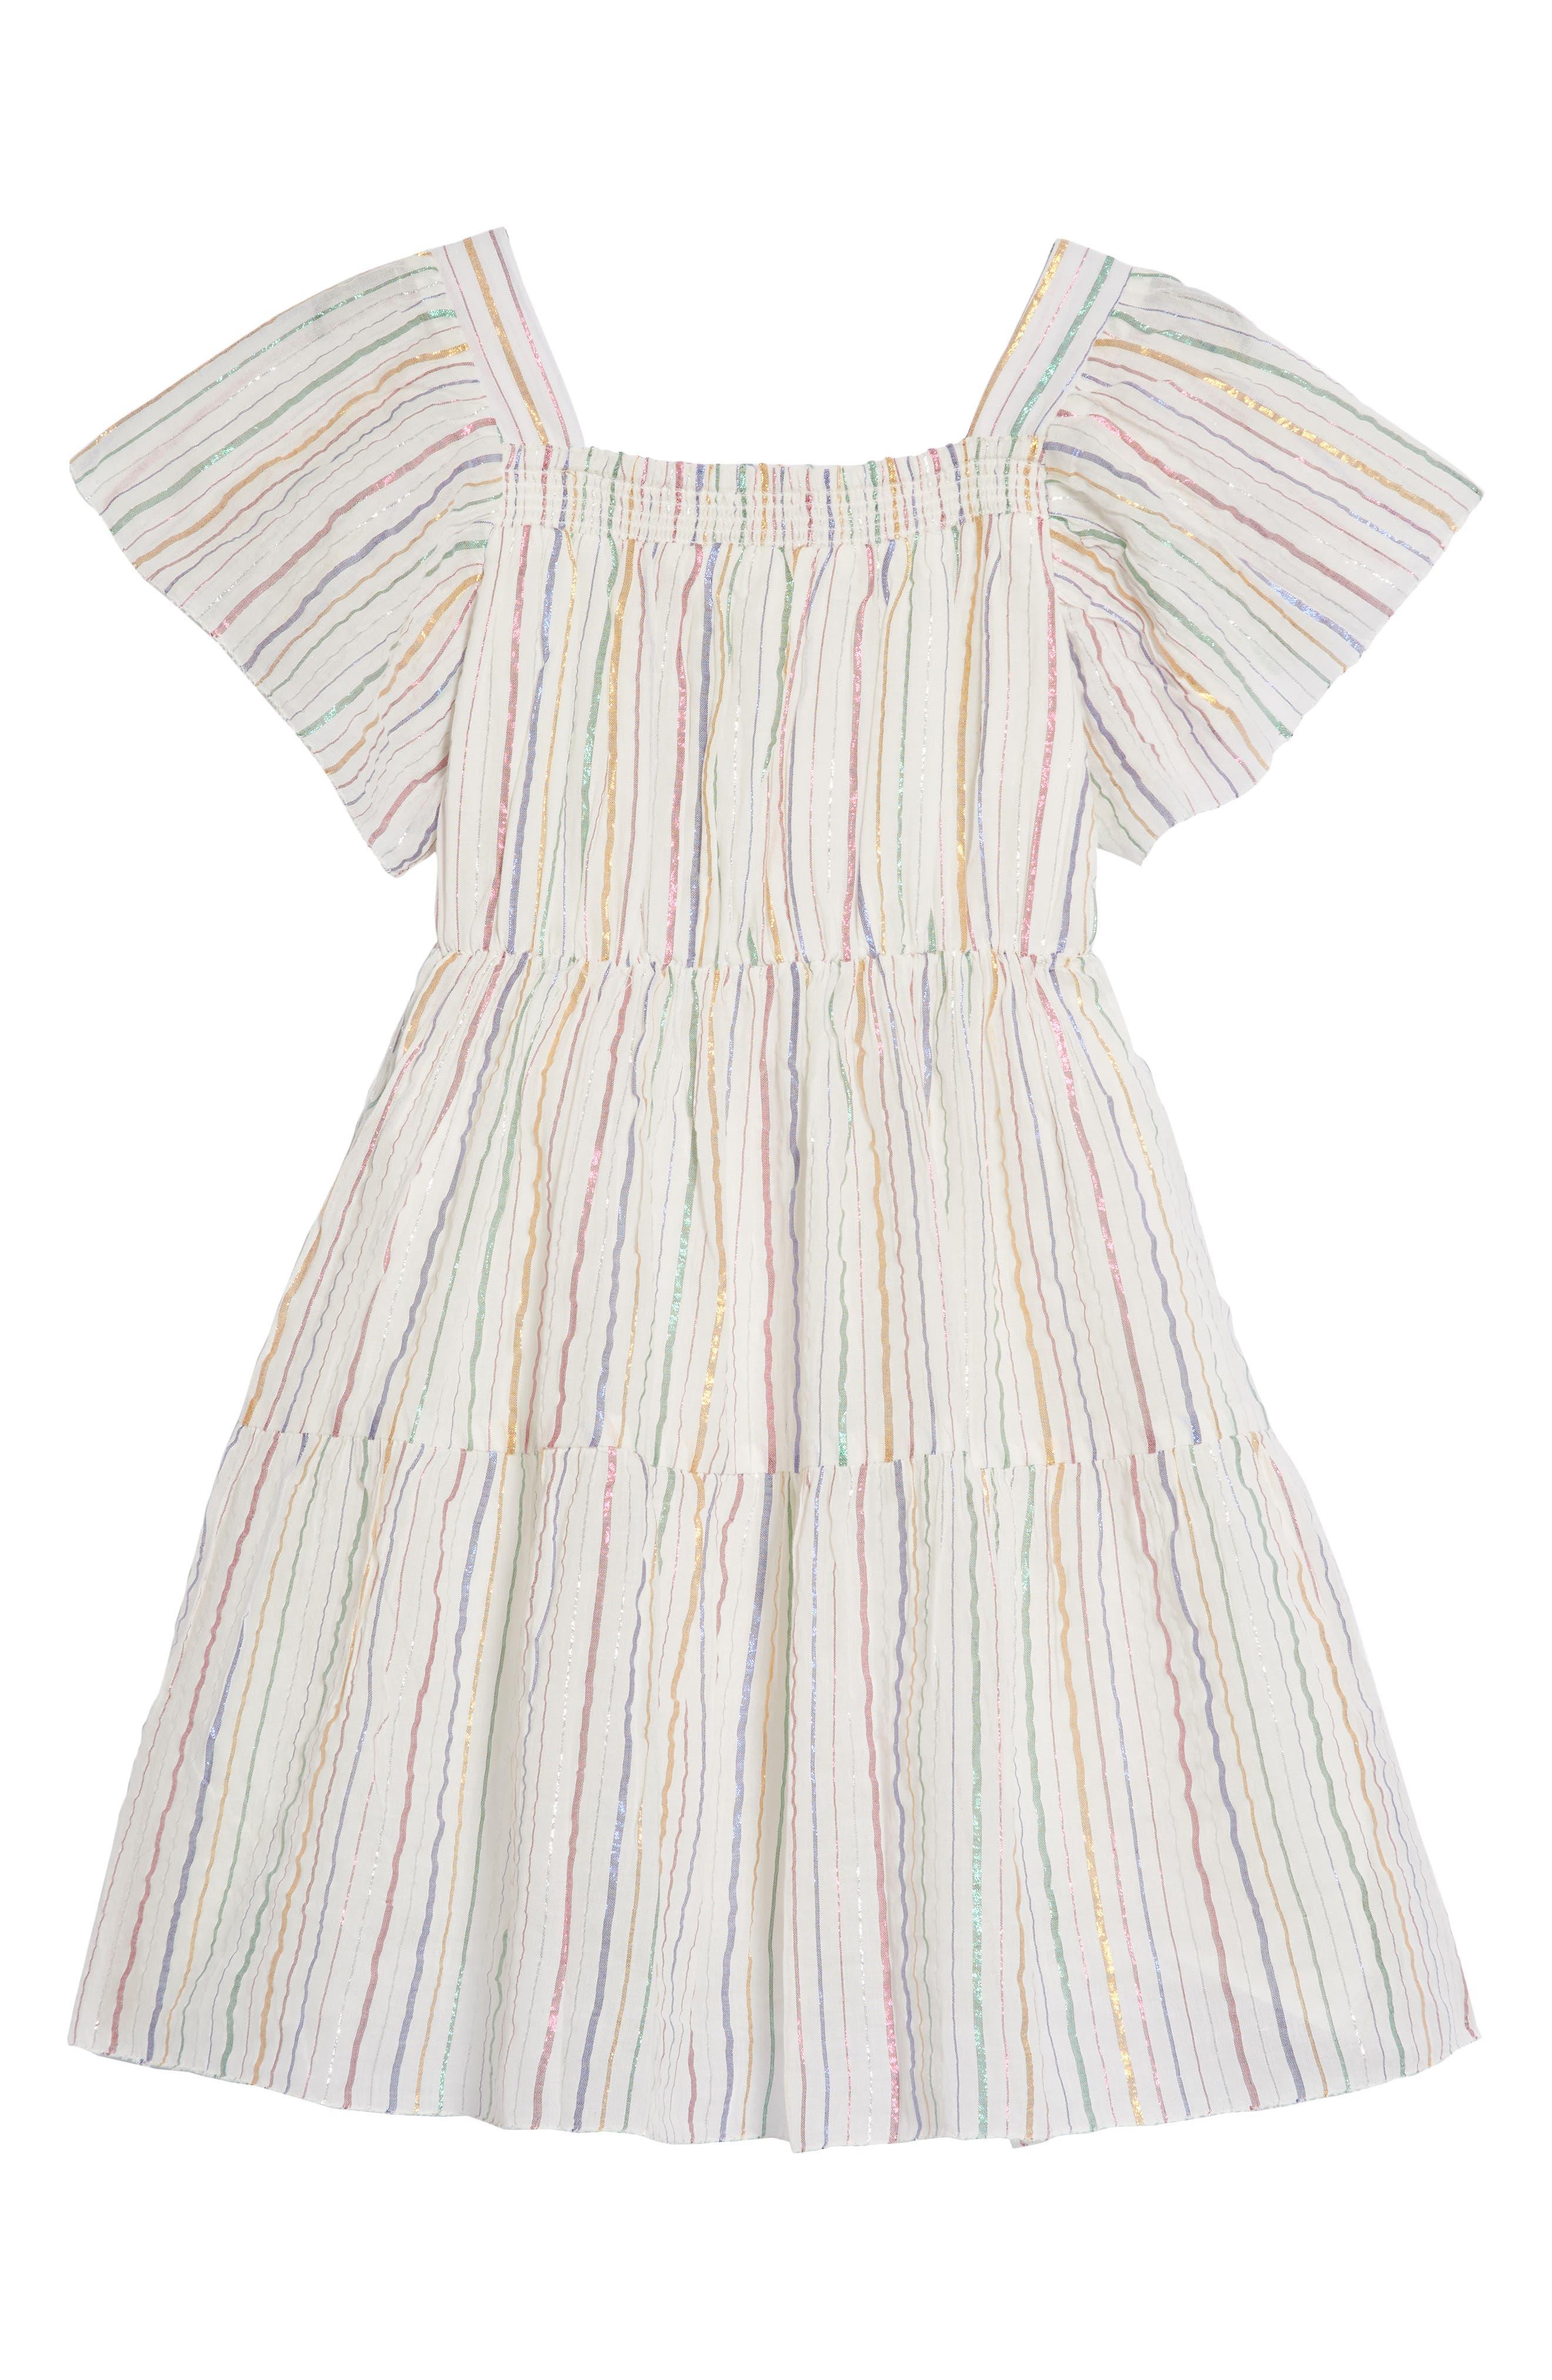 Sienna Dress,                             Alternate thumbnail 2, color,                             Rose Gold